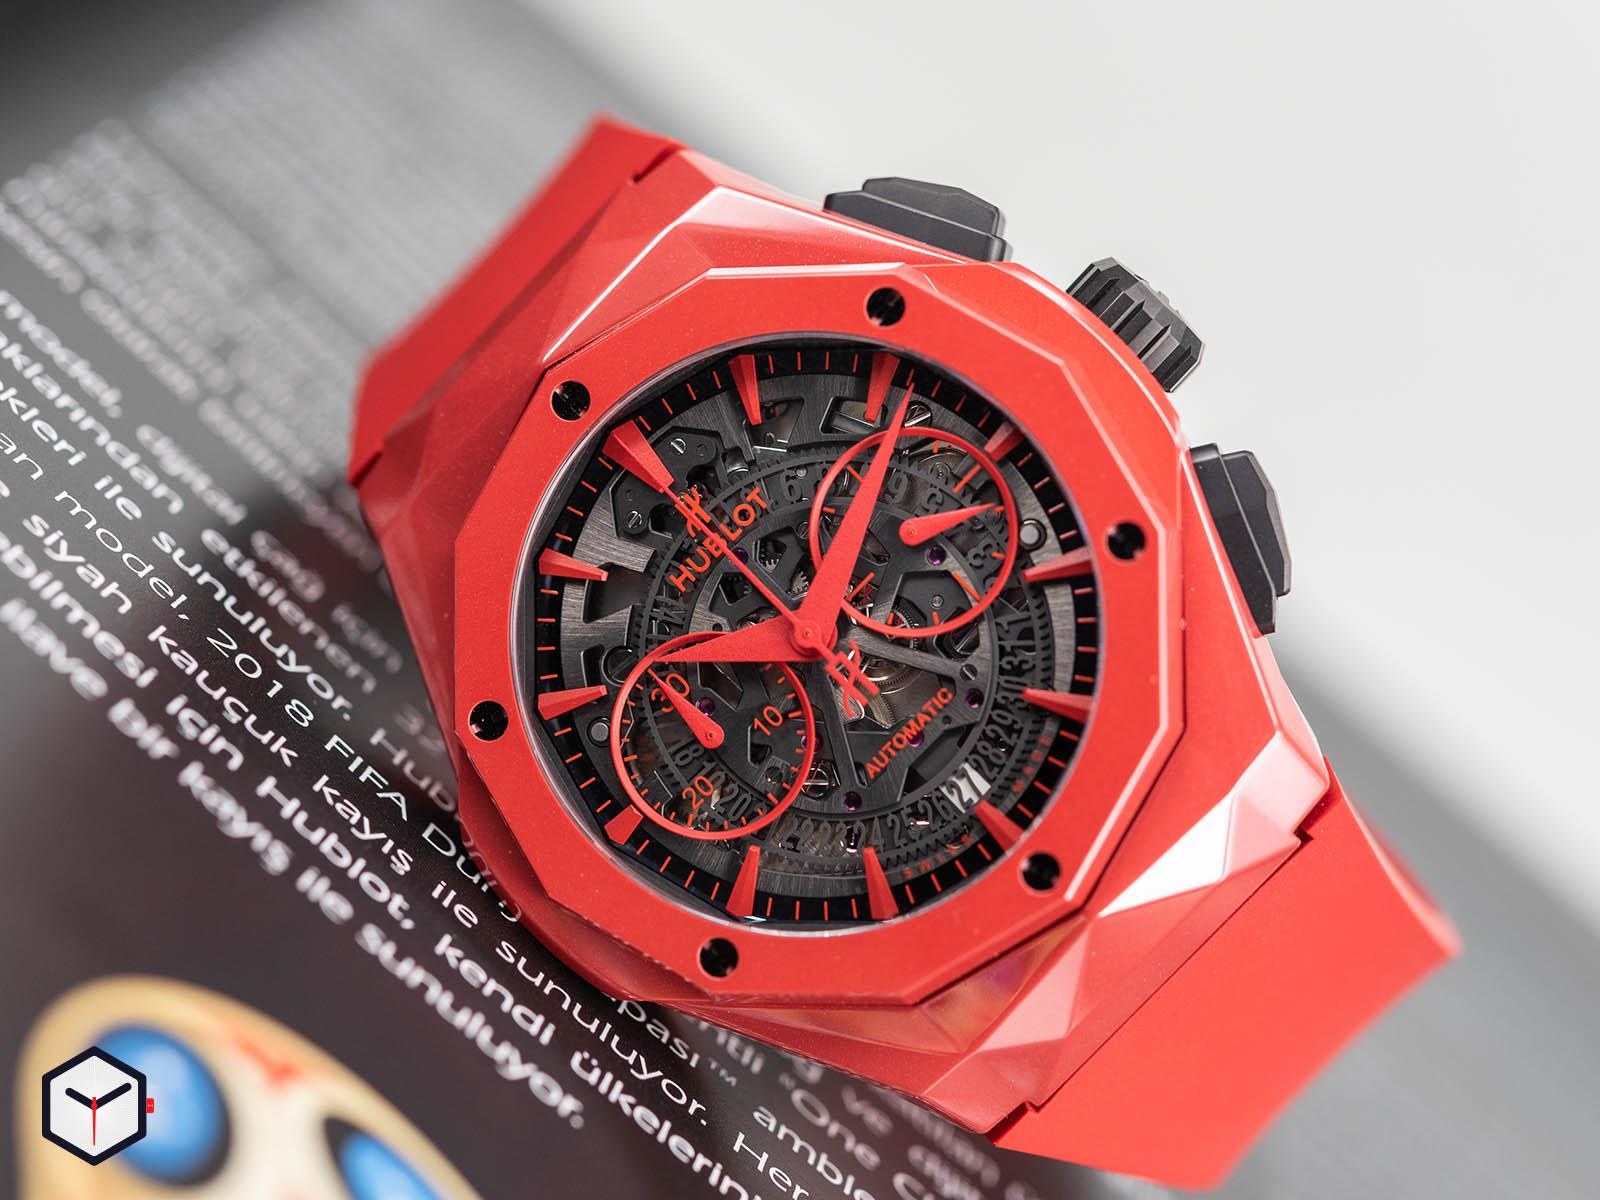 525-cf-0130-rx-orl19-hublot-classic-fusion-chronograph-orlinski-red-ceramic-3.jpg